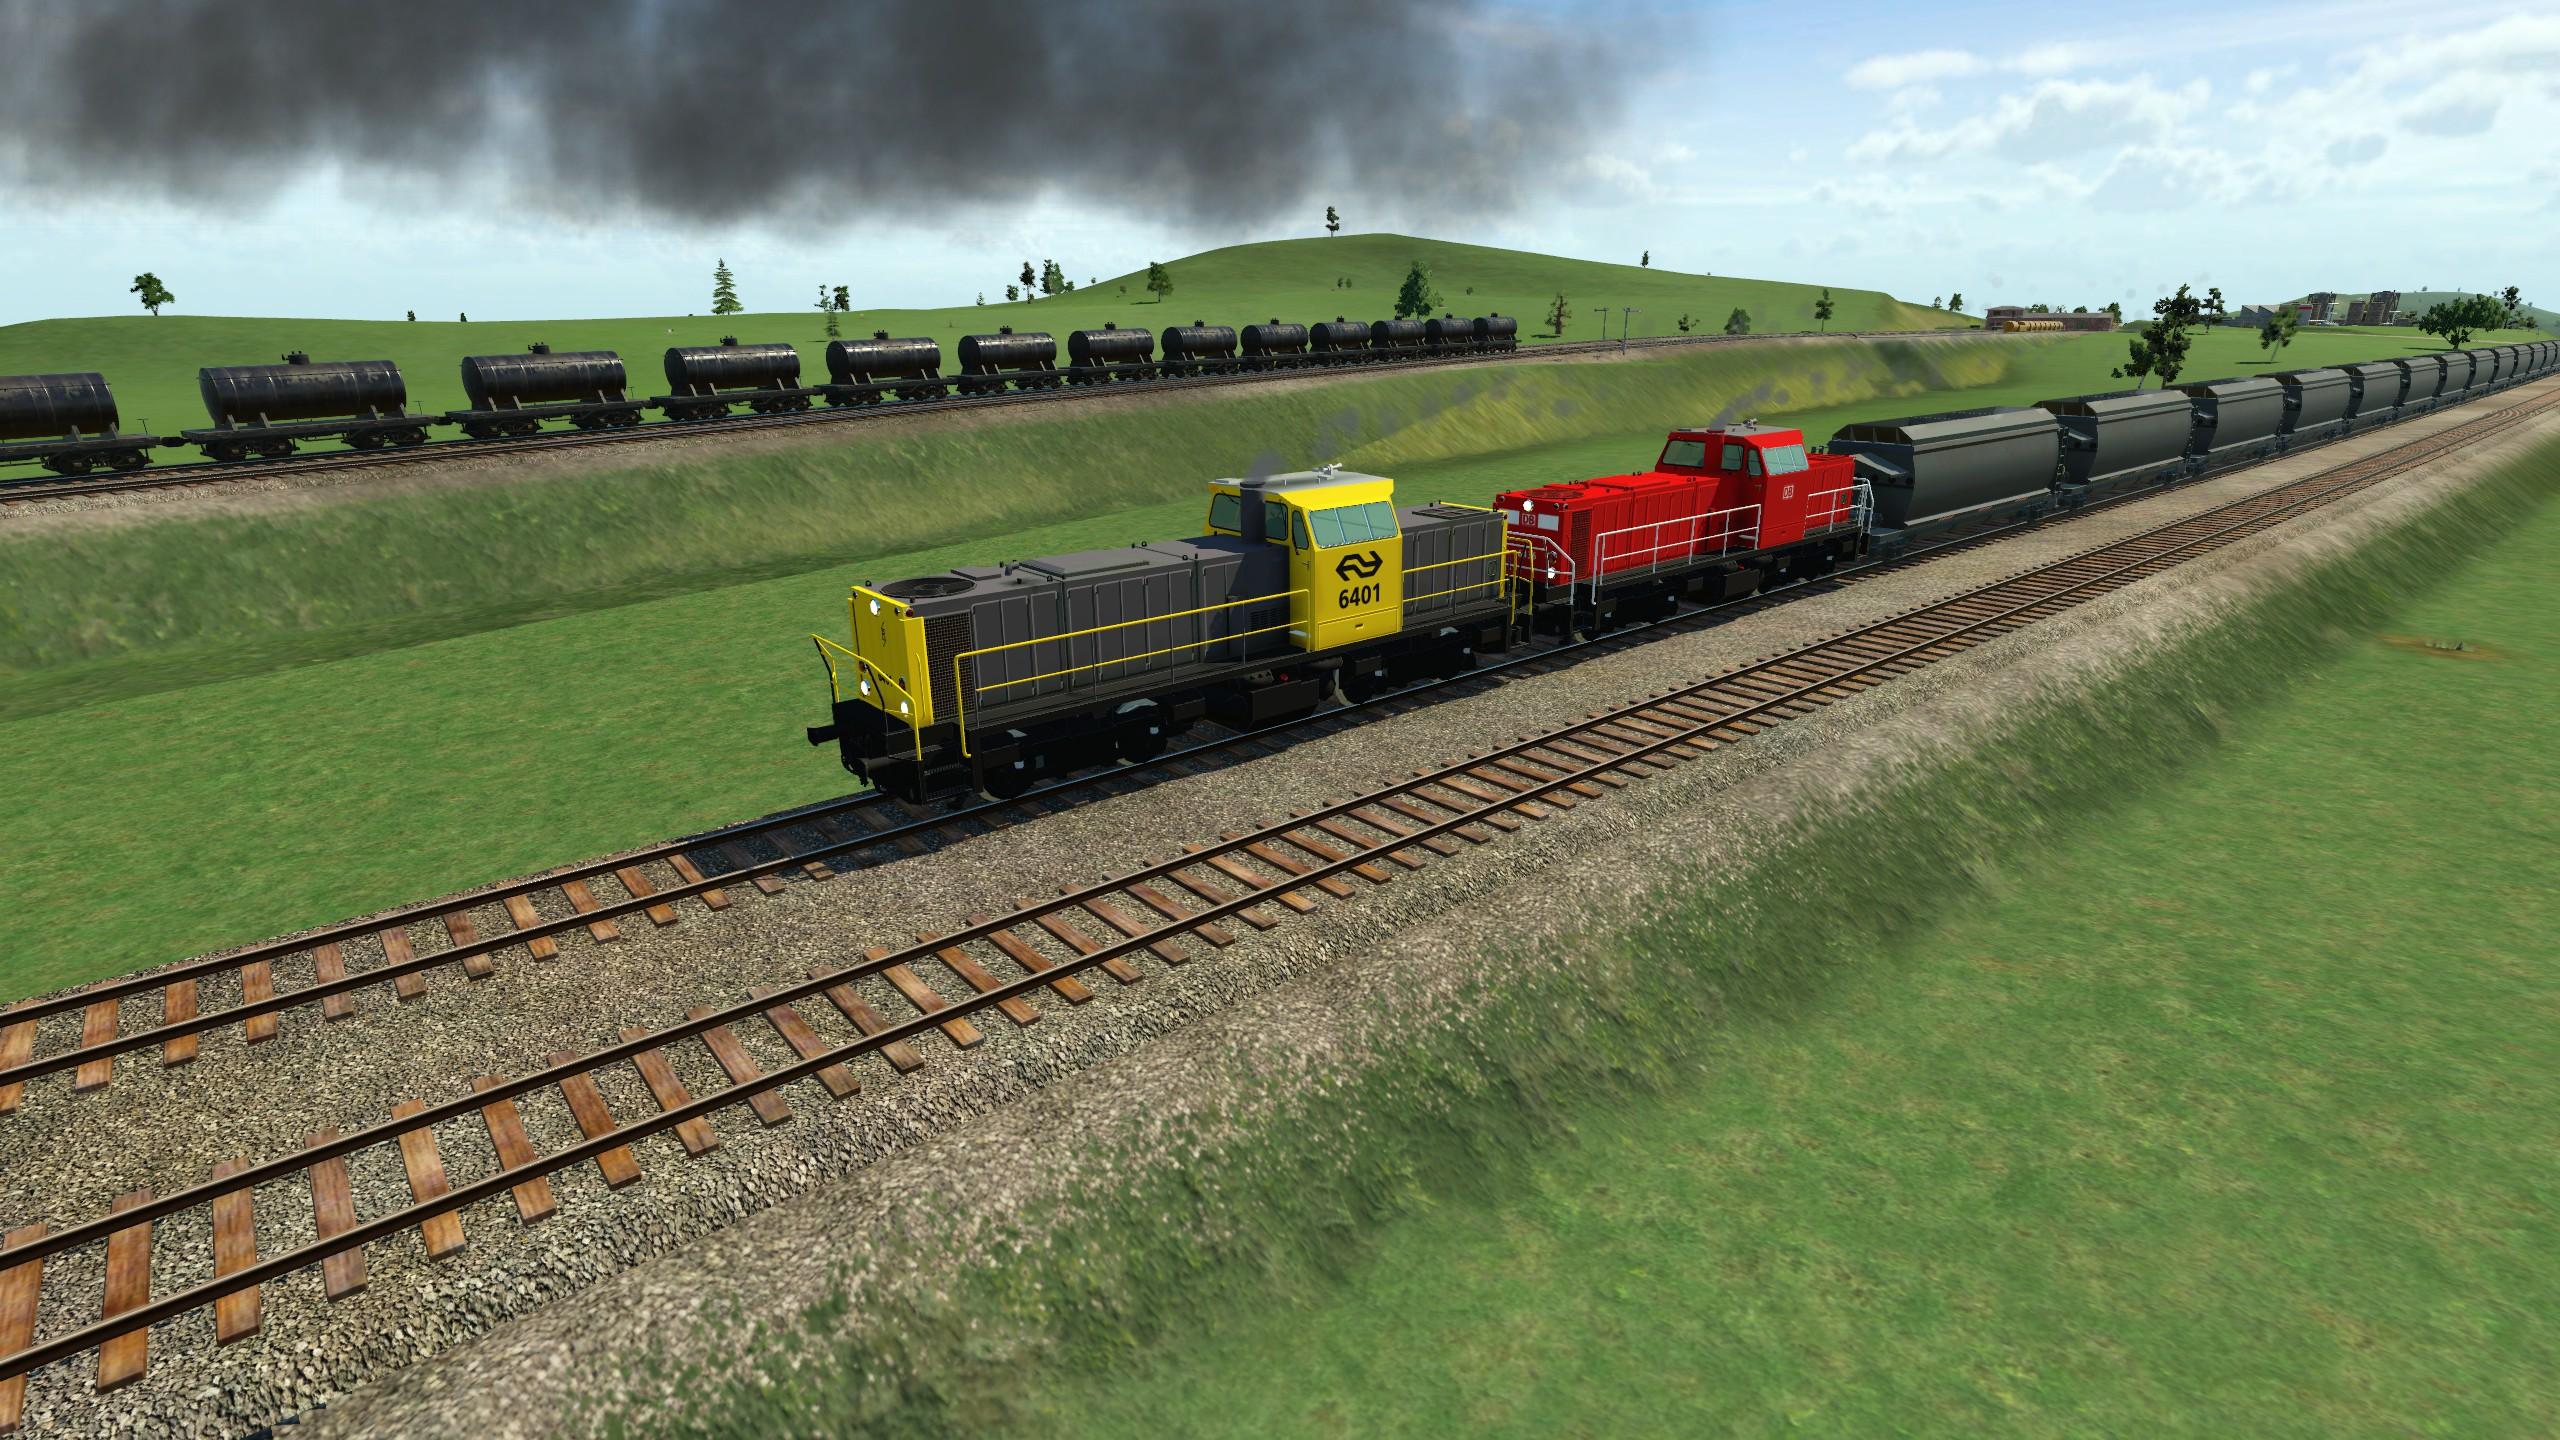 Skiwee's Profile | Train Fever